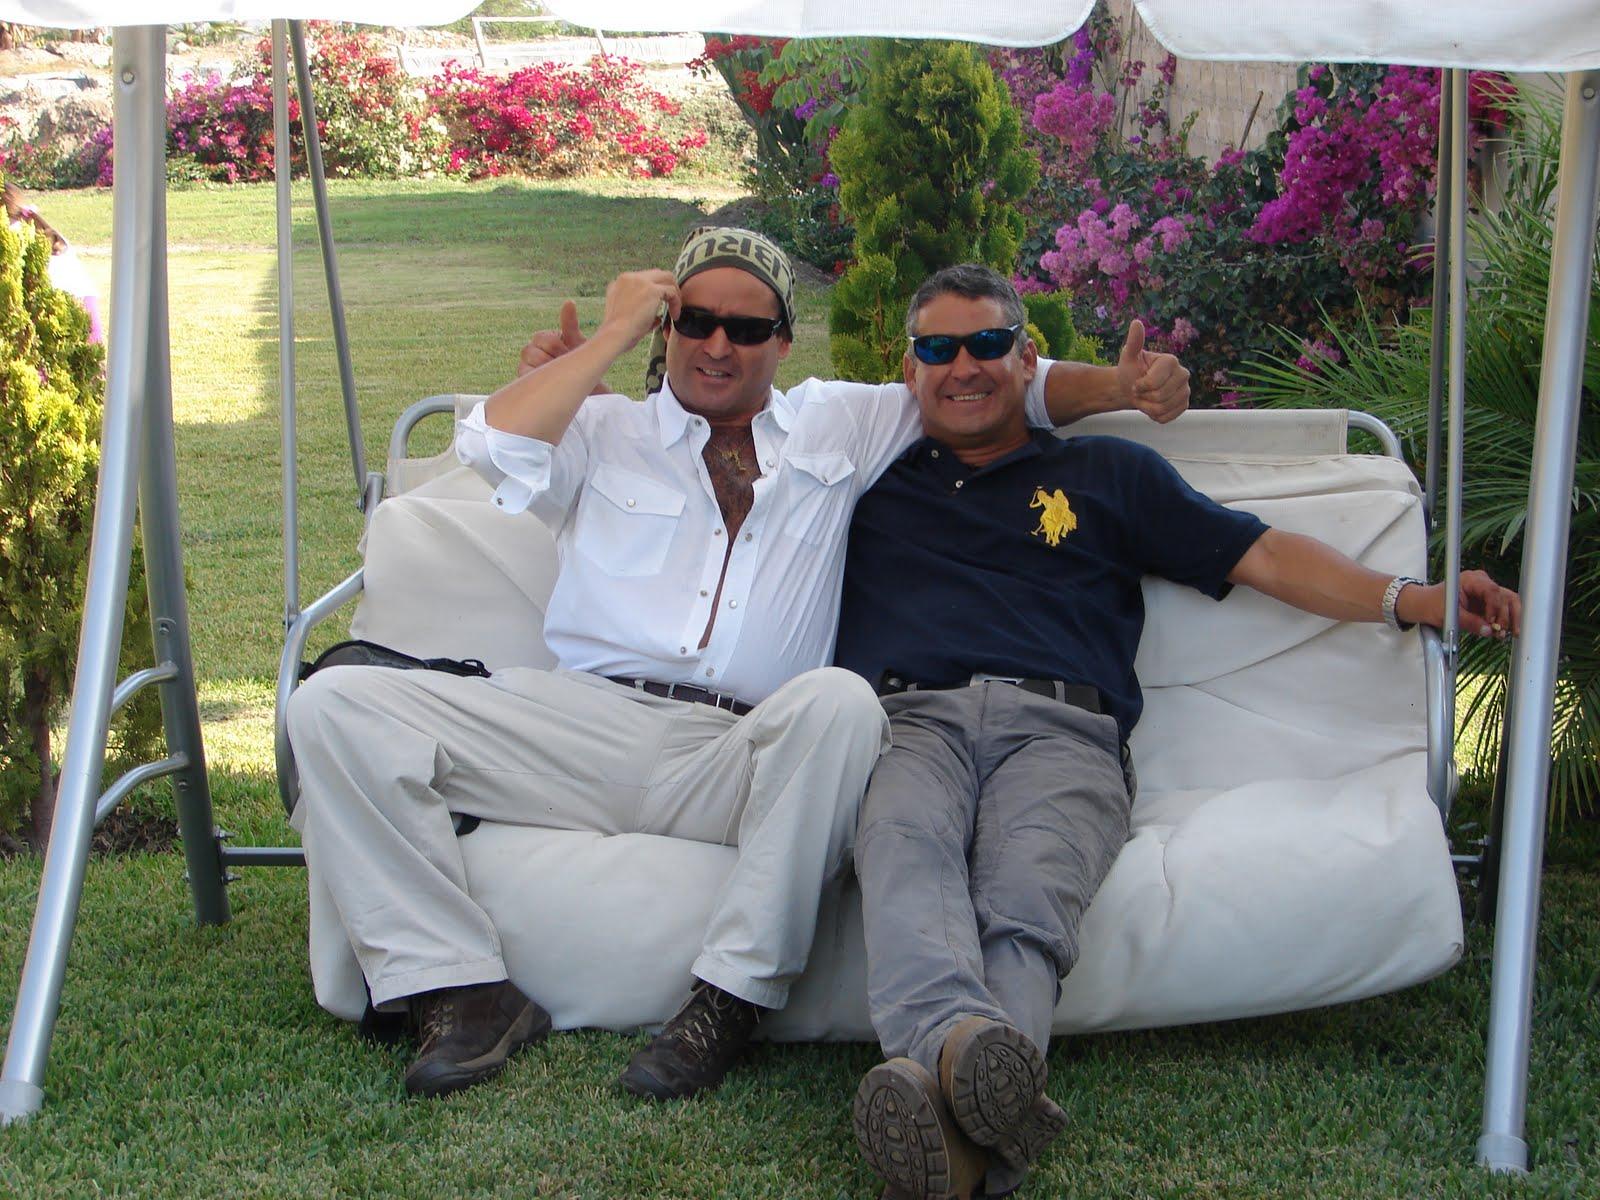 23-mayo-22-21-24-25...2011 los Trujillo fundo San Luis...Maximooos,Mundo...